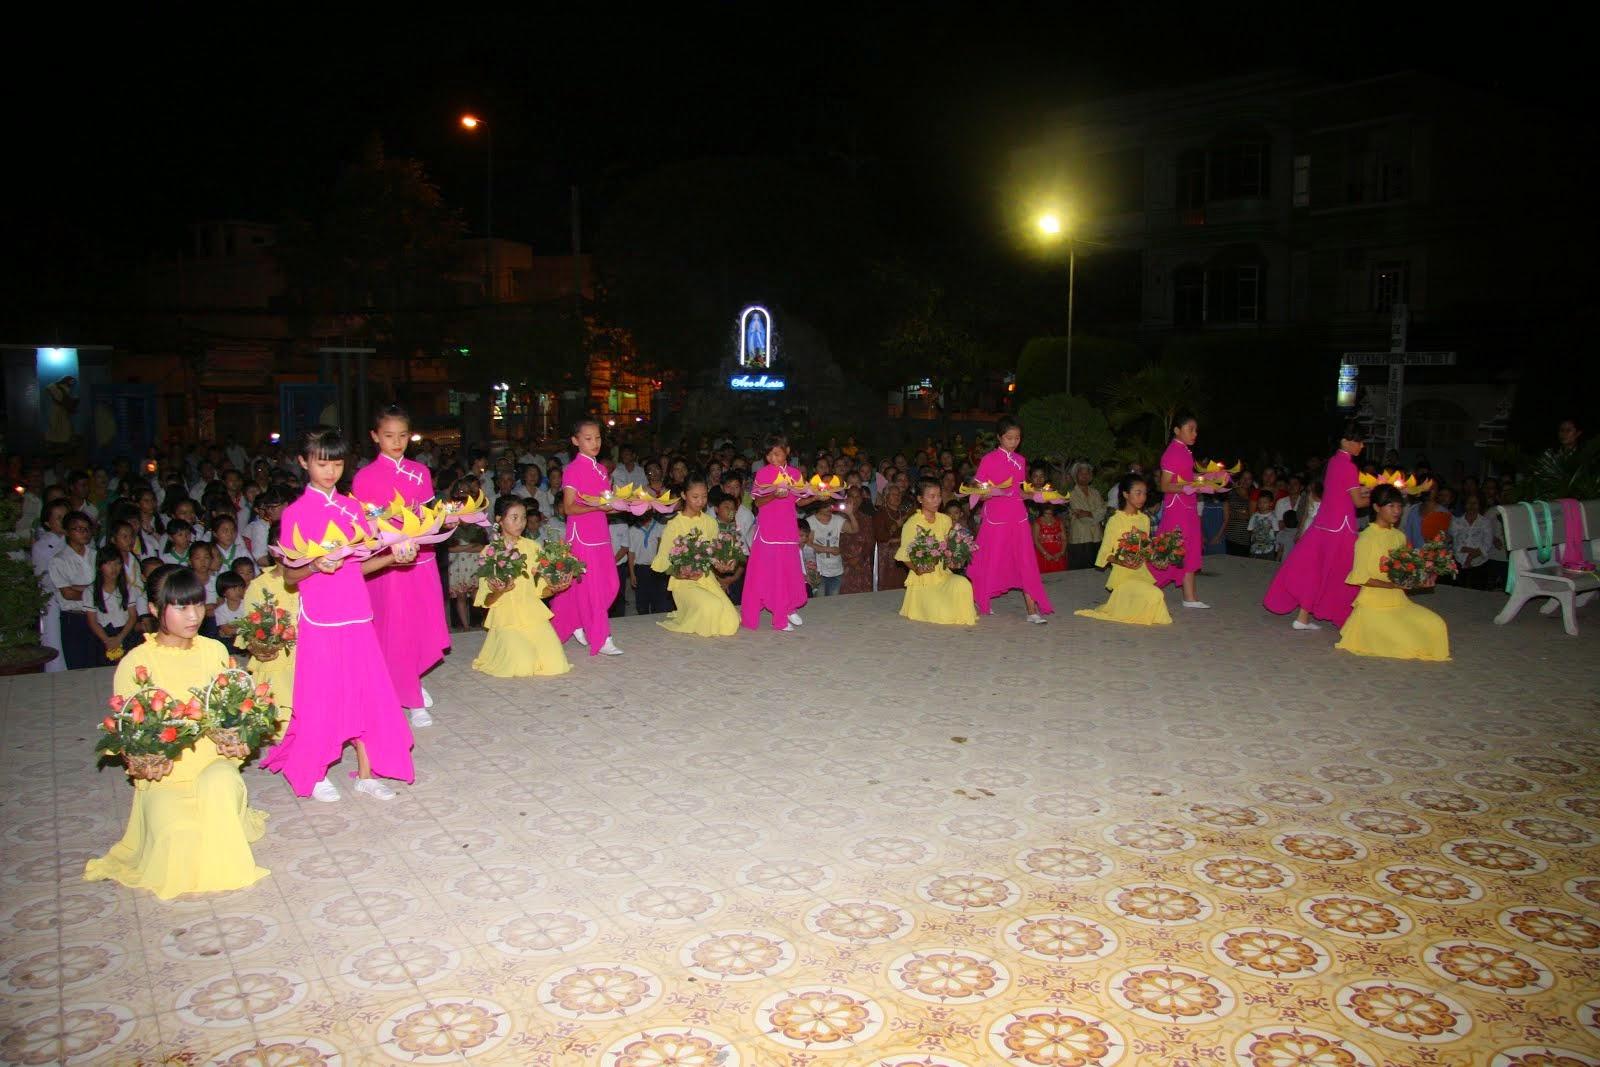 THÁNG HOA - 5-2015